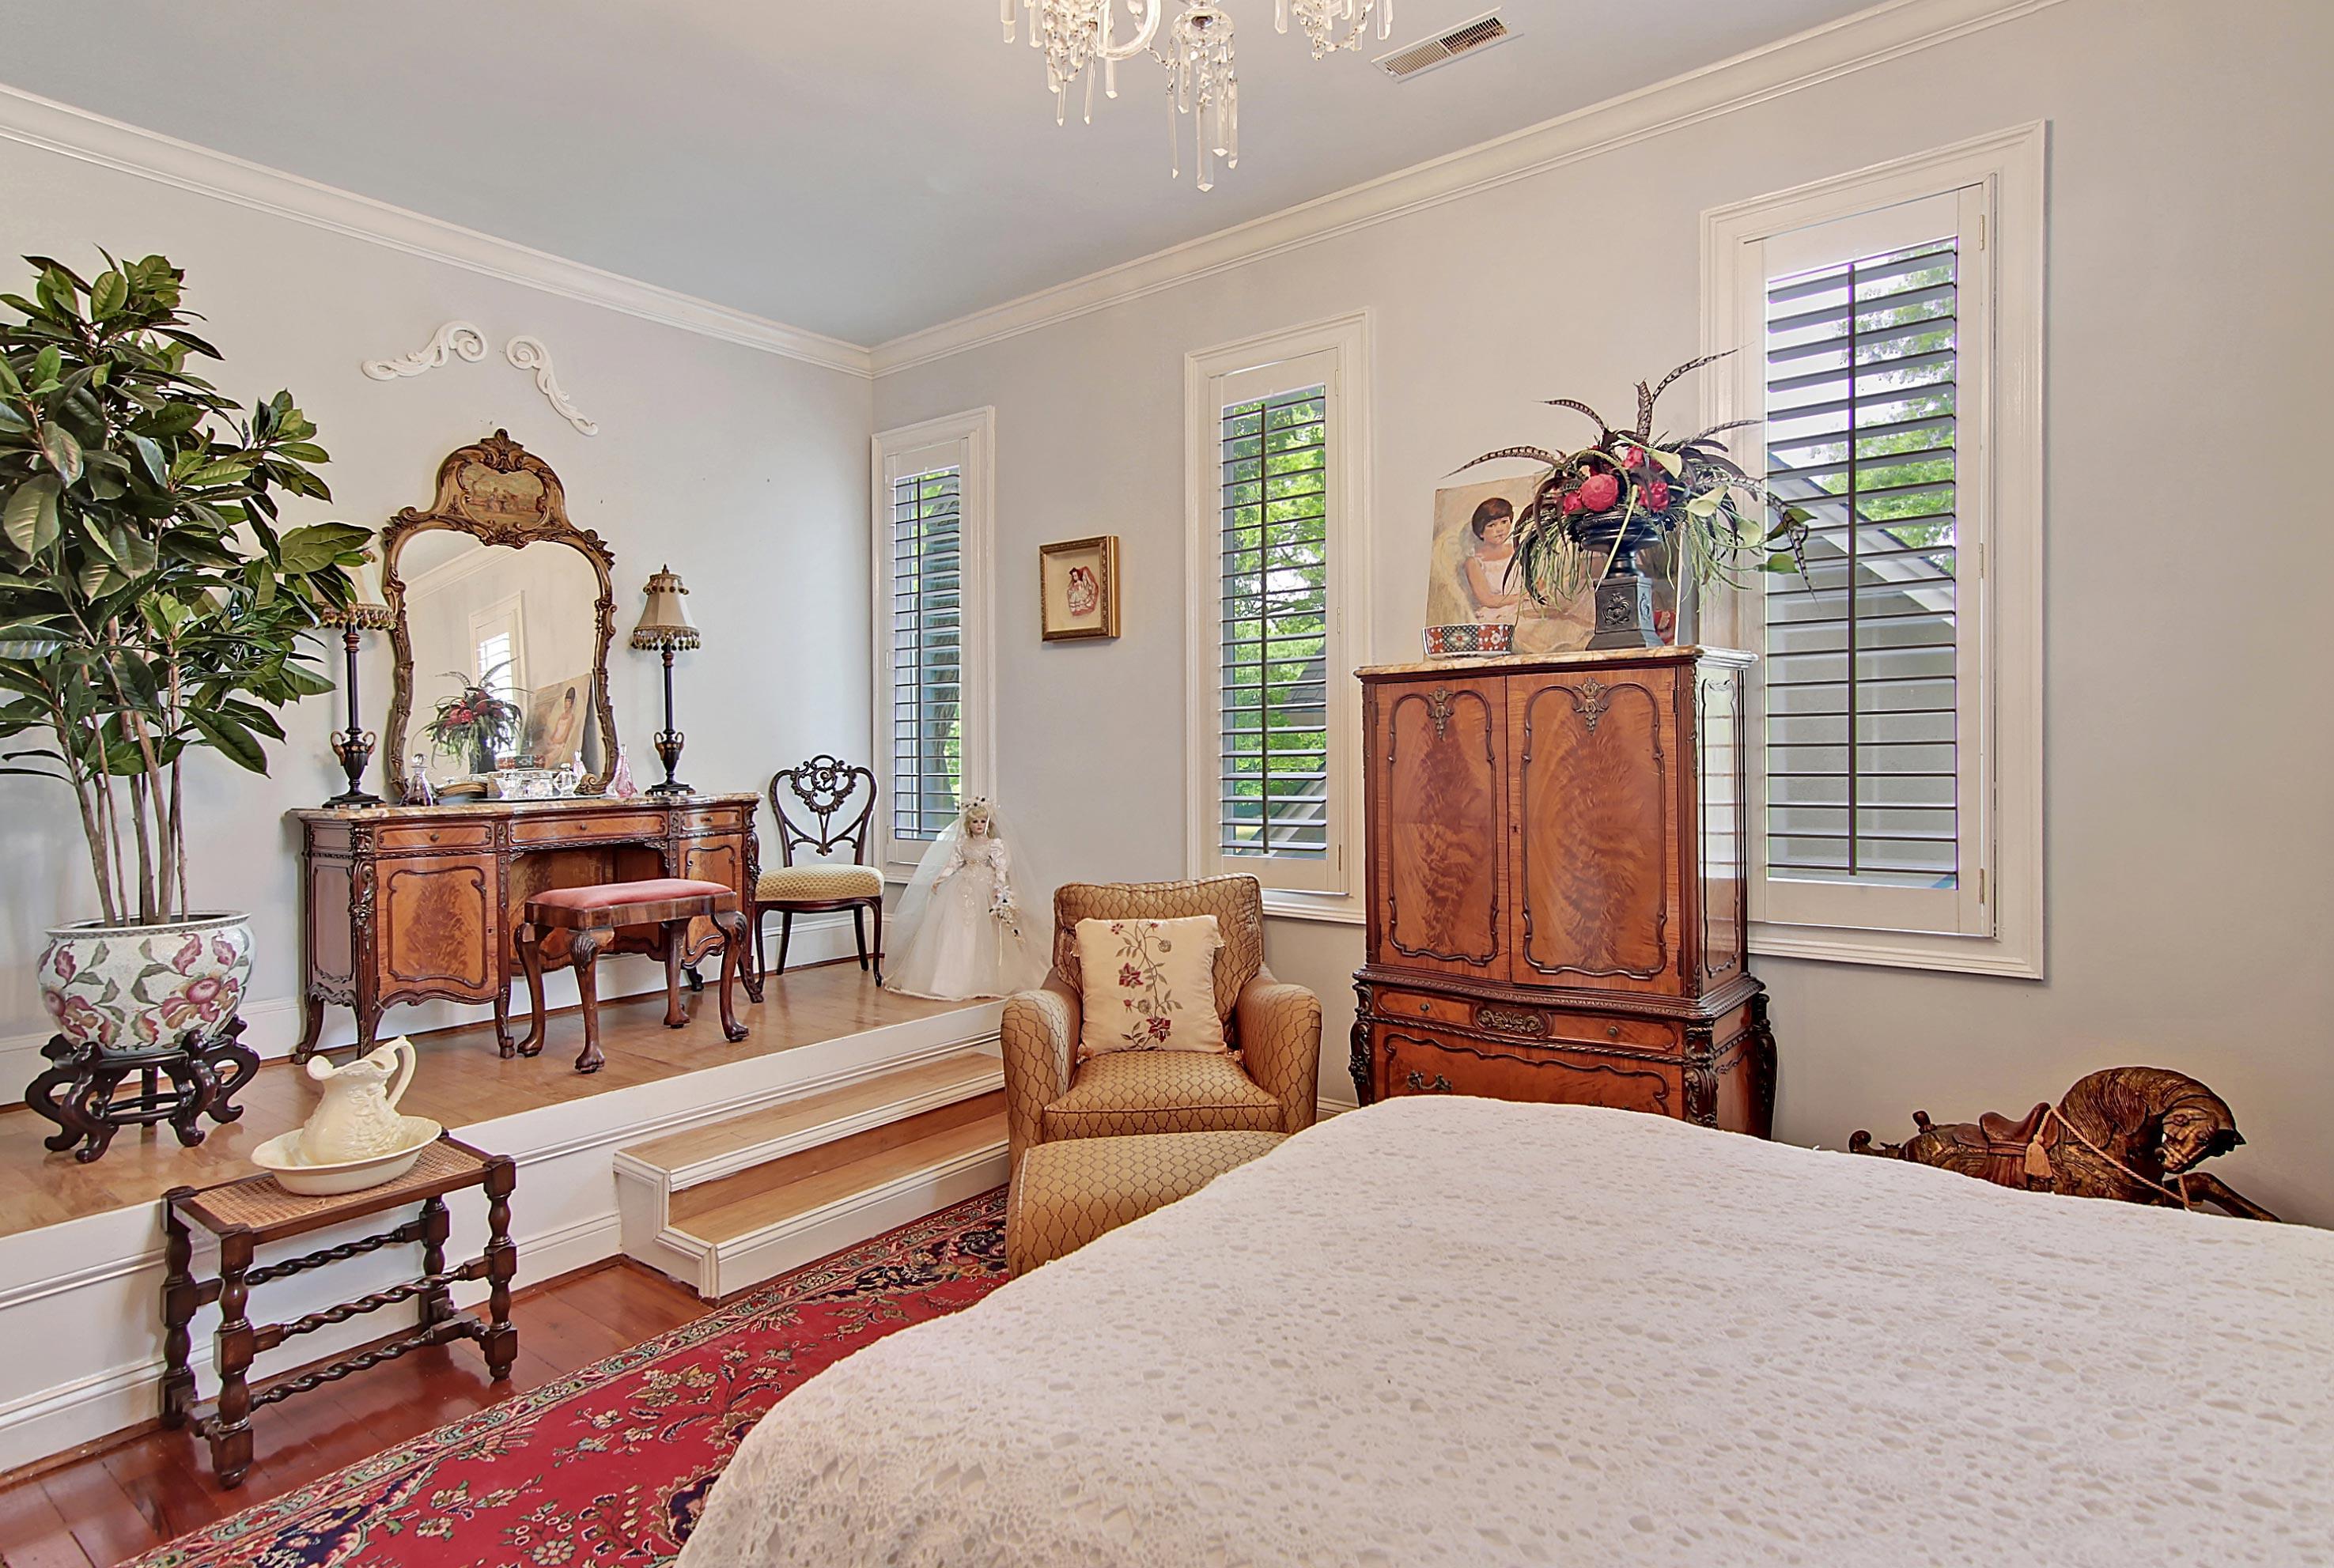 Edgewater Park Homes For Sale - 1323 Edgewater, Charleston, SC - 28